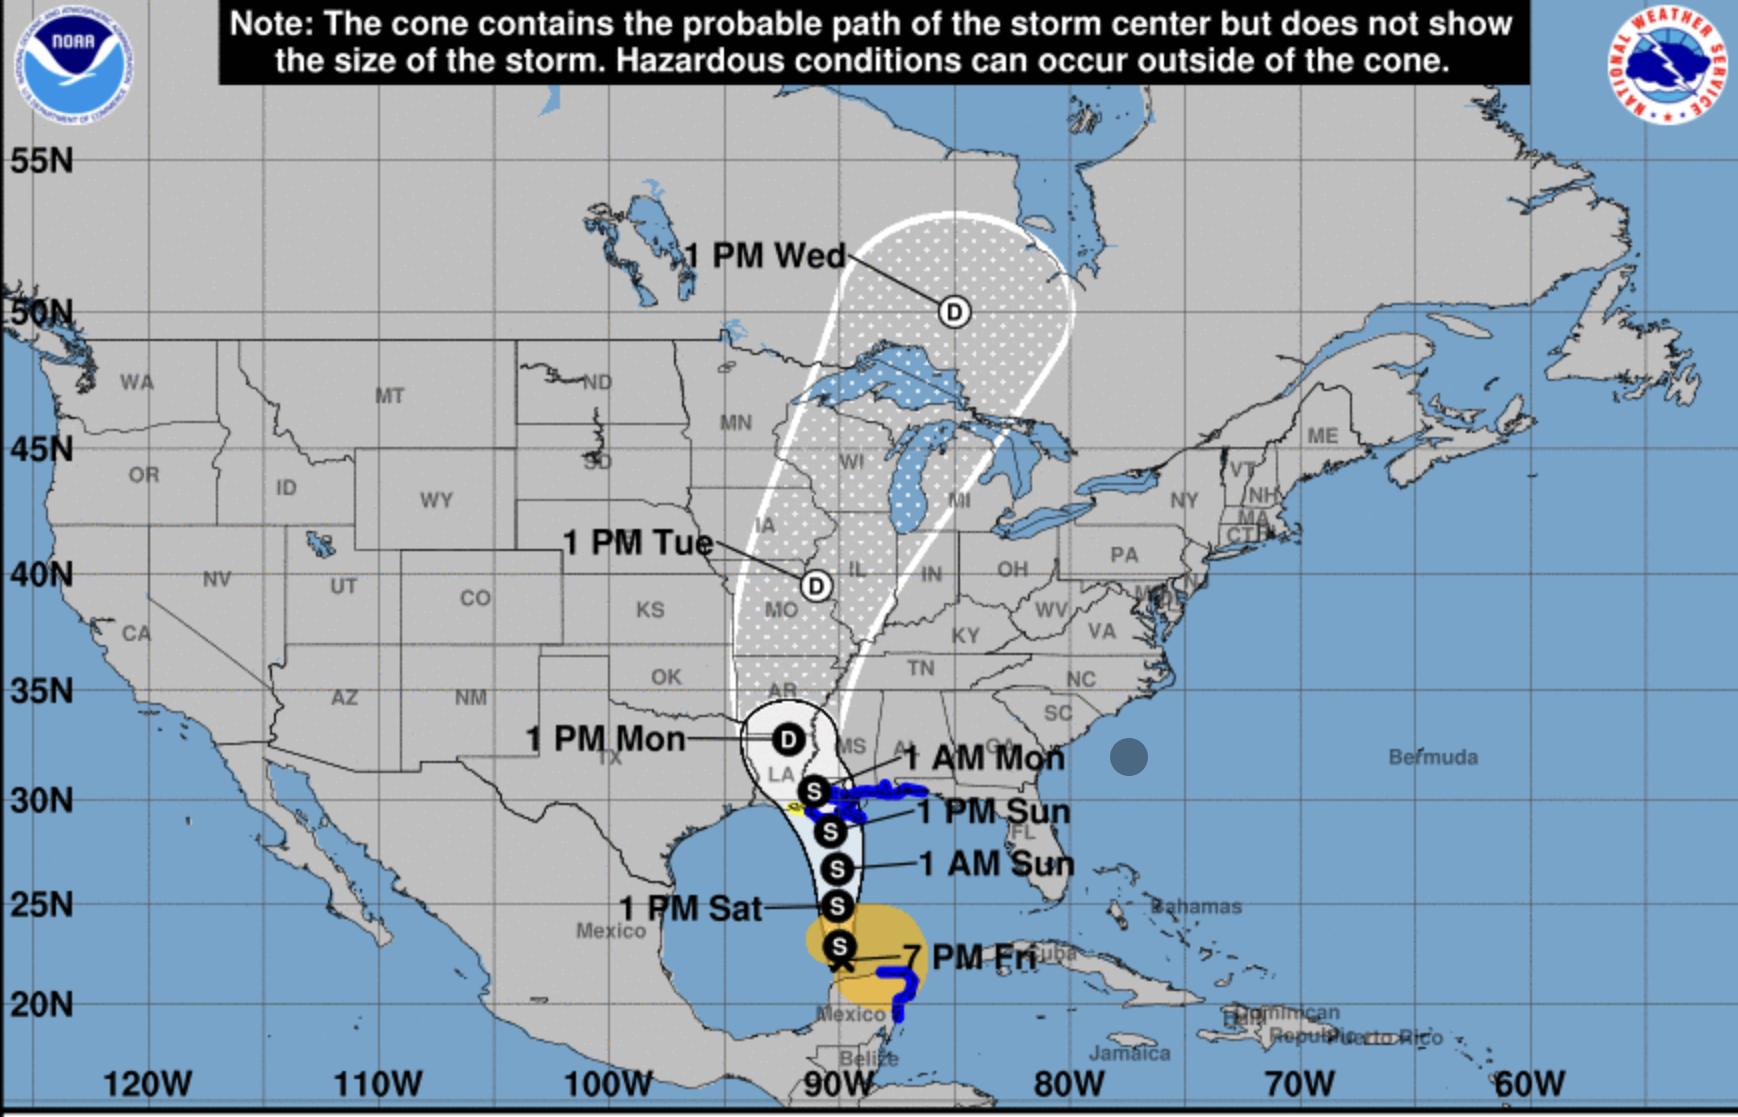 Hurricane Center Tropical Storm Warning As Cristobal Heads To Us Mainland Bocanewsnow Com